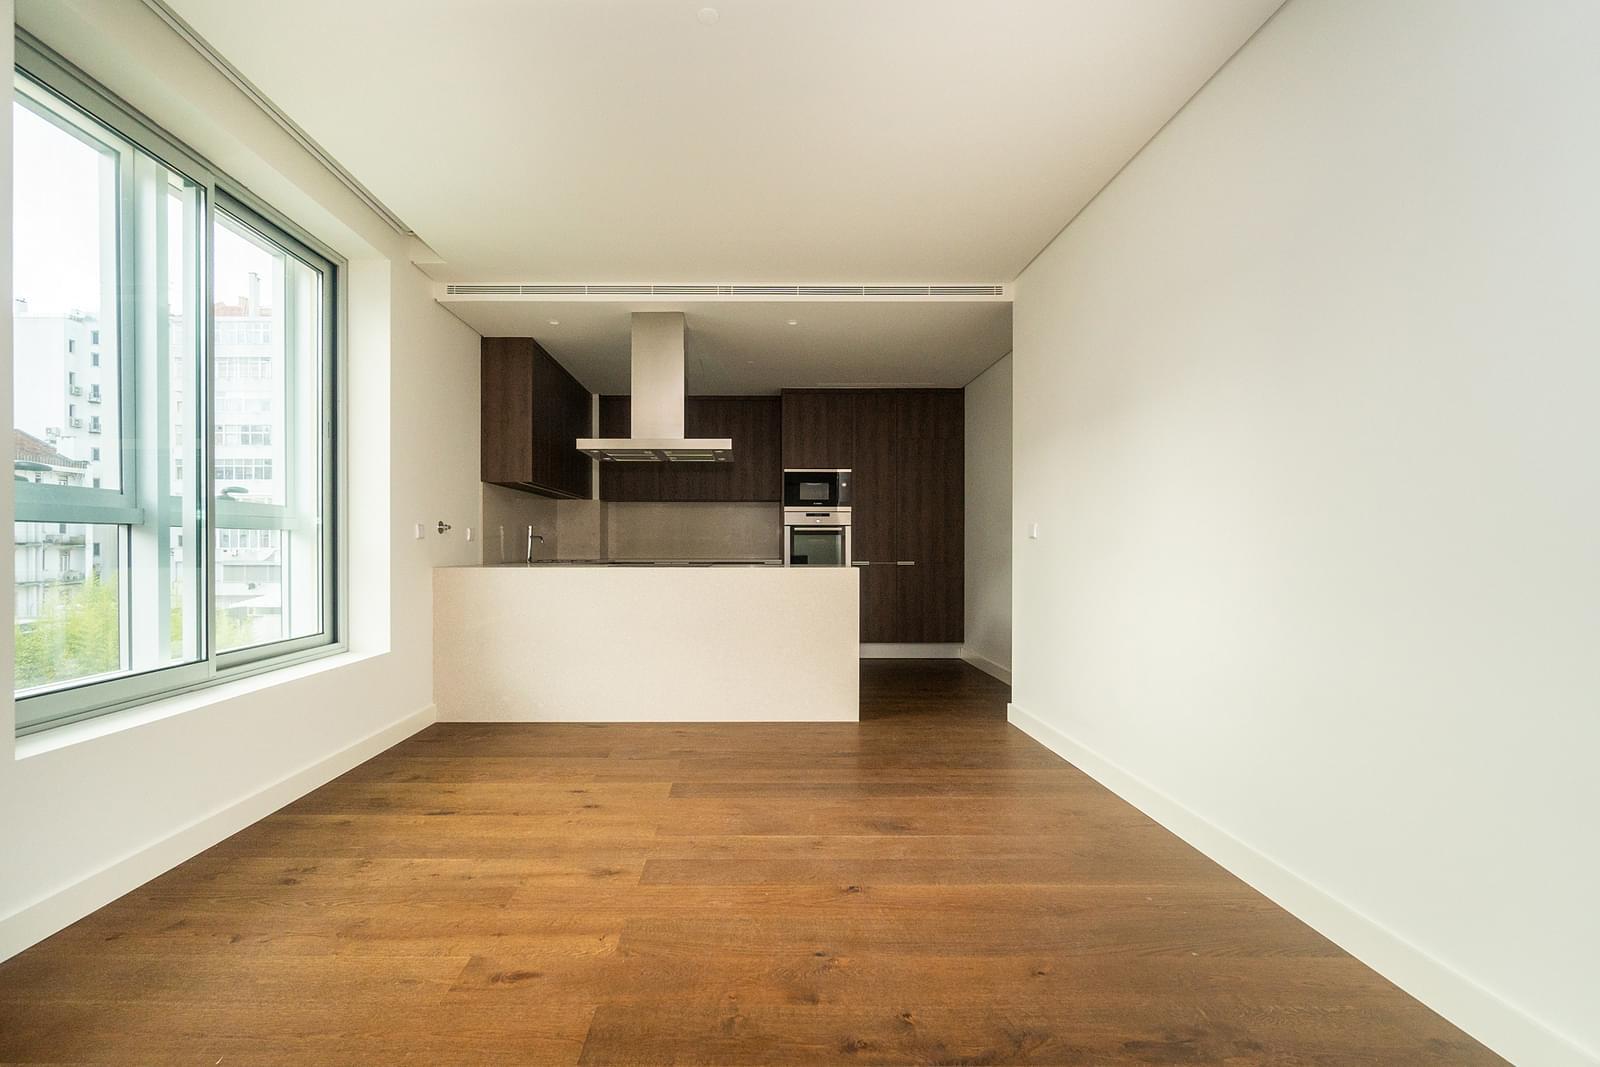 pf18694-apartamento-t3-lisboa-8f8fb8b6-d4e3-4ea8-b77e-a876d492edd7